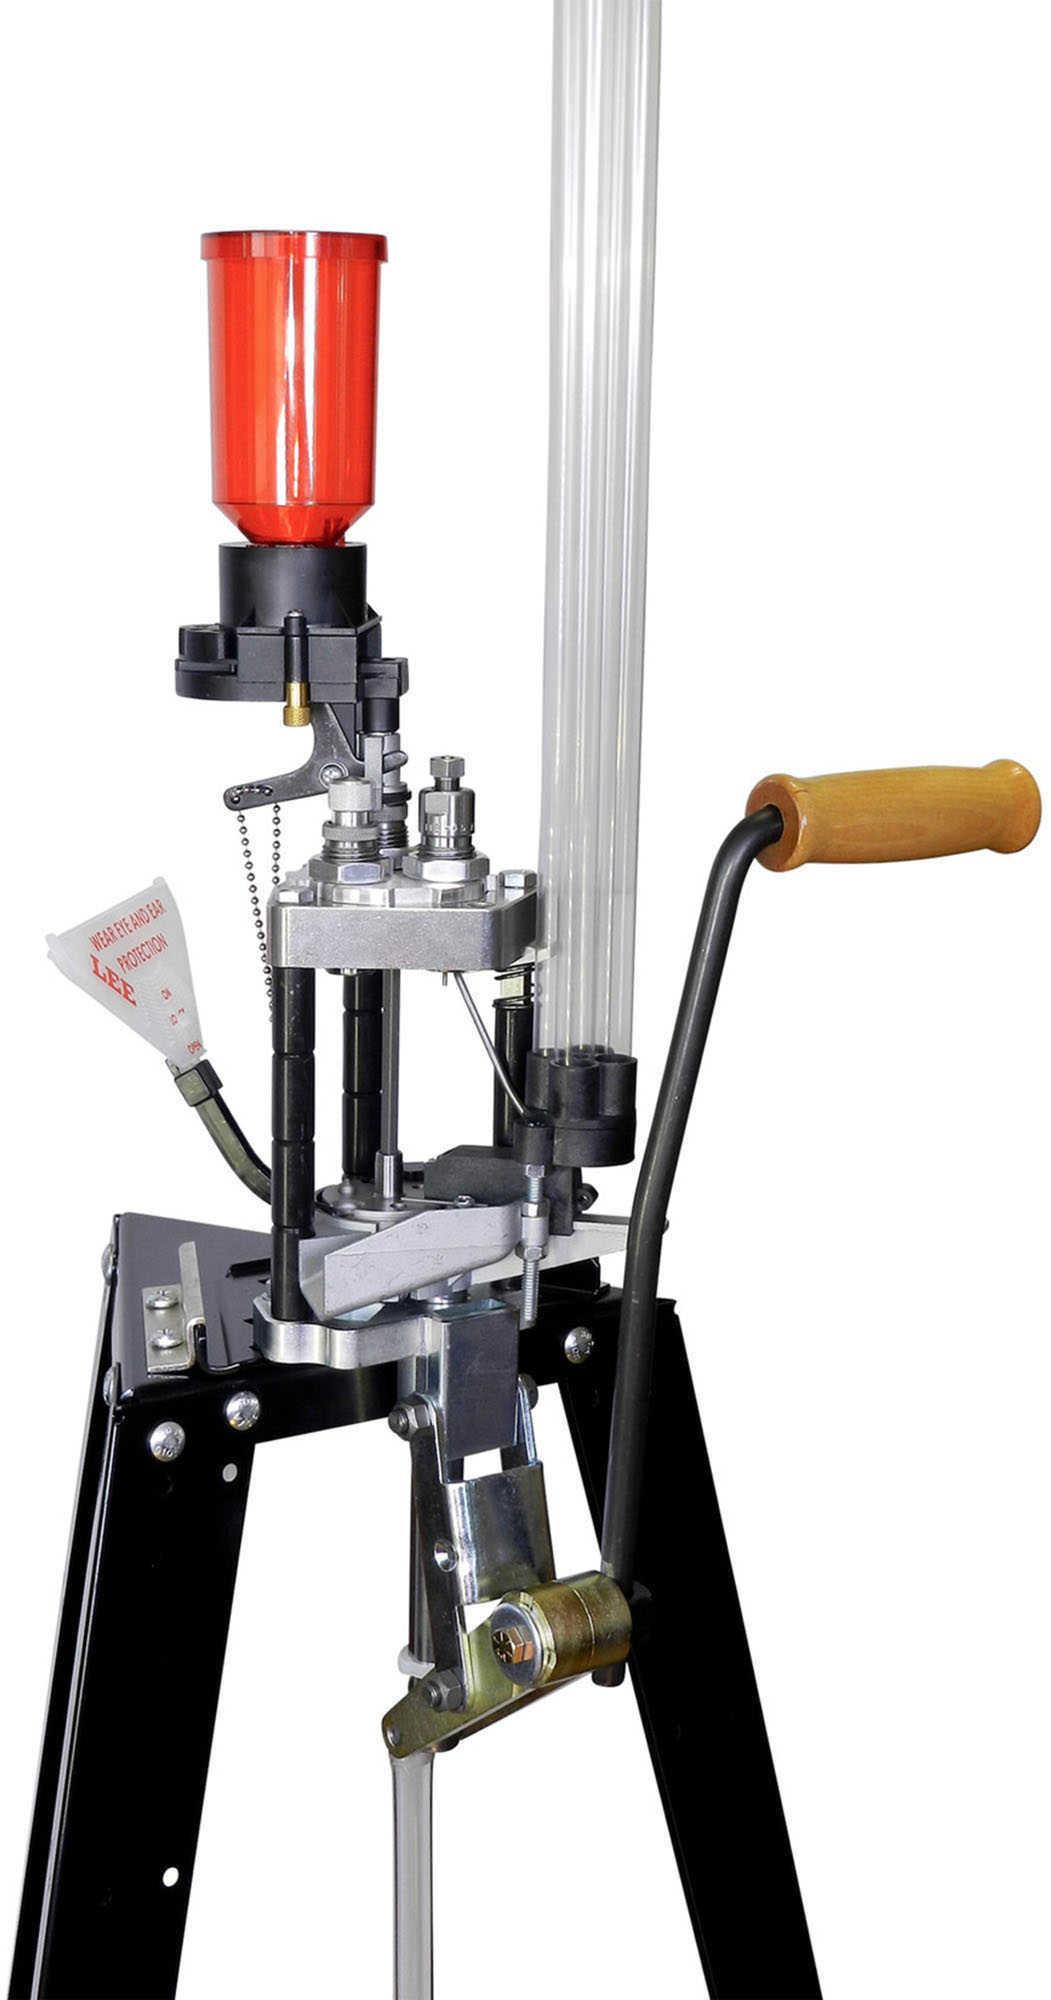 Lee Pro 1000 Reloading Kit For 45 ACP Md: 90638